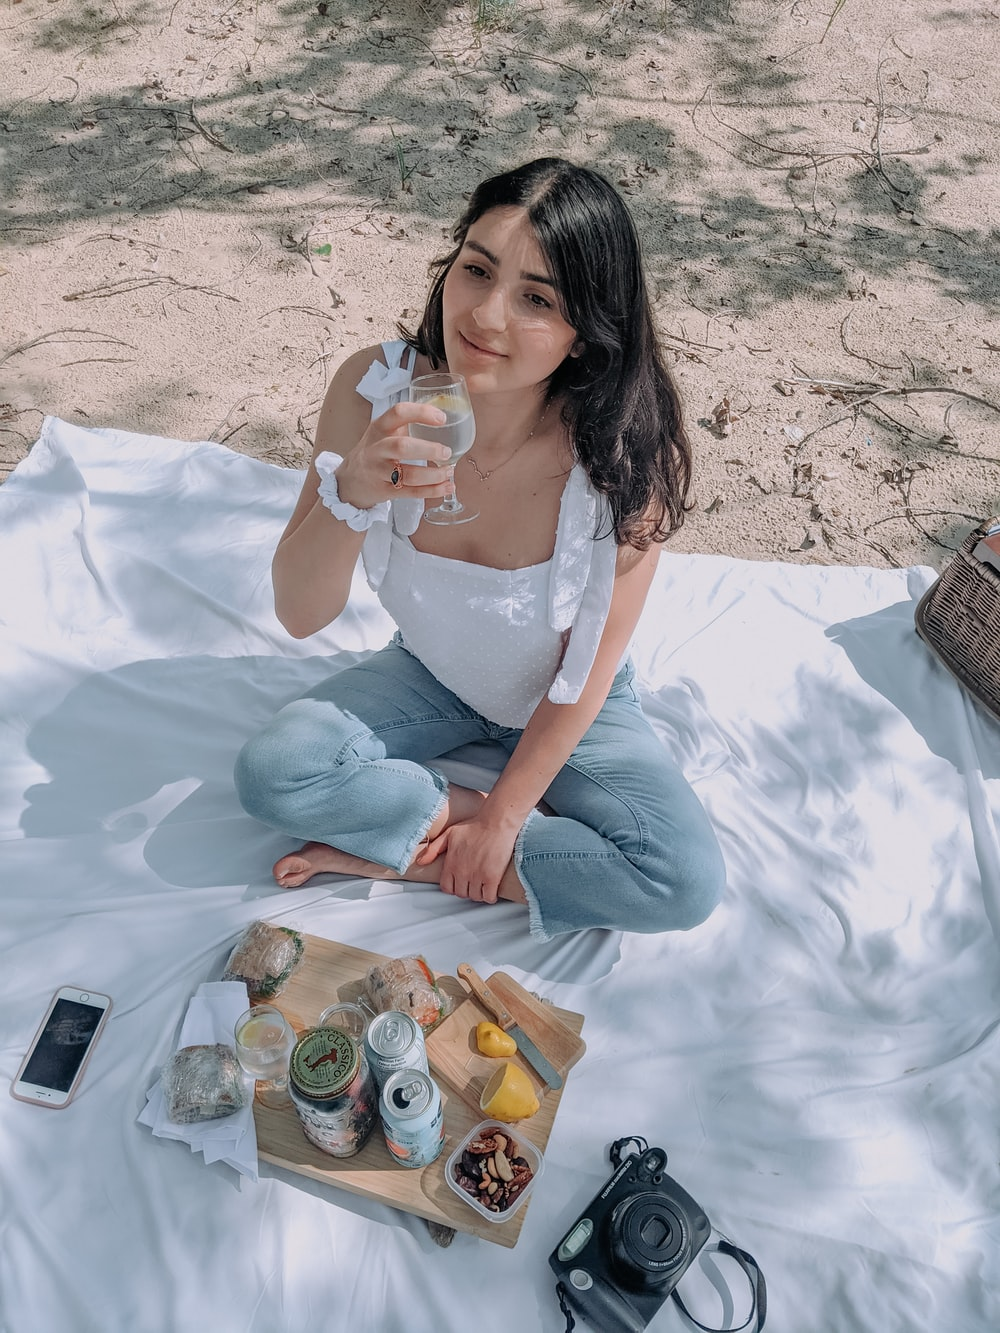 woman in white dress sitting on white textile